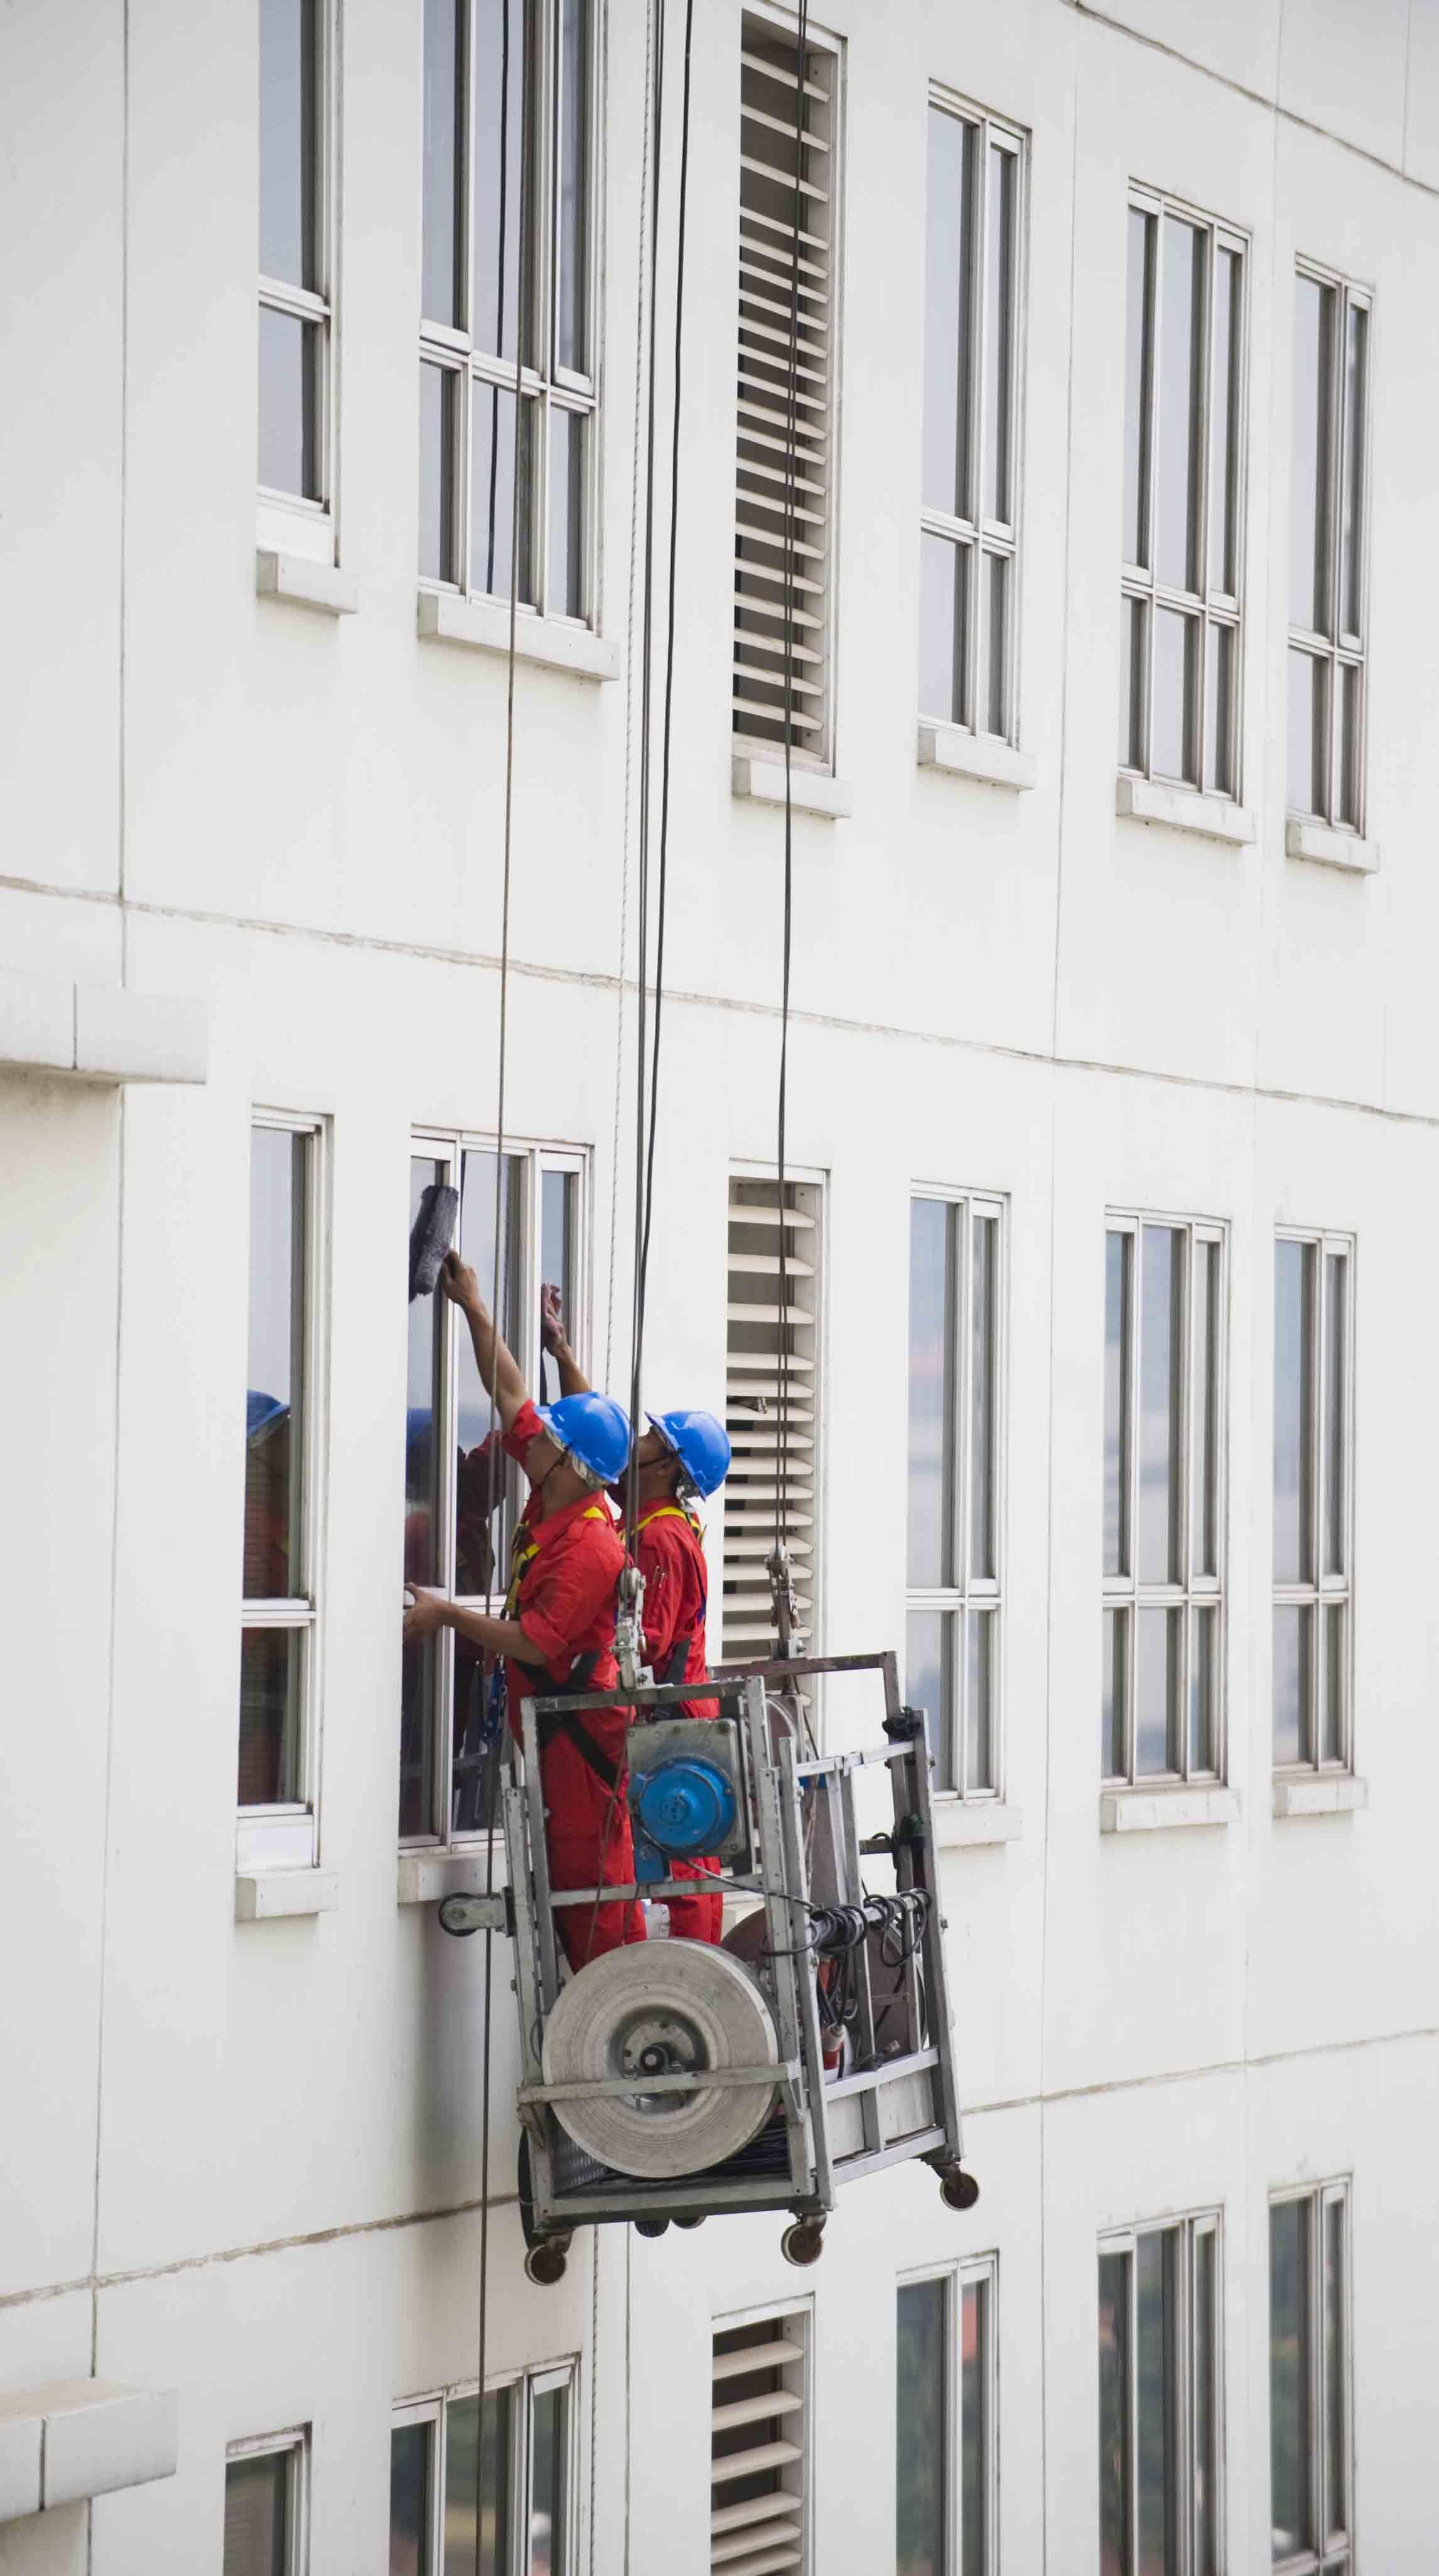 Penjelasan Lengkap Mengenai Tugas Dan Tanggung Jawab Maintenance Hes Indonesia